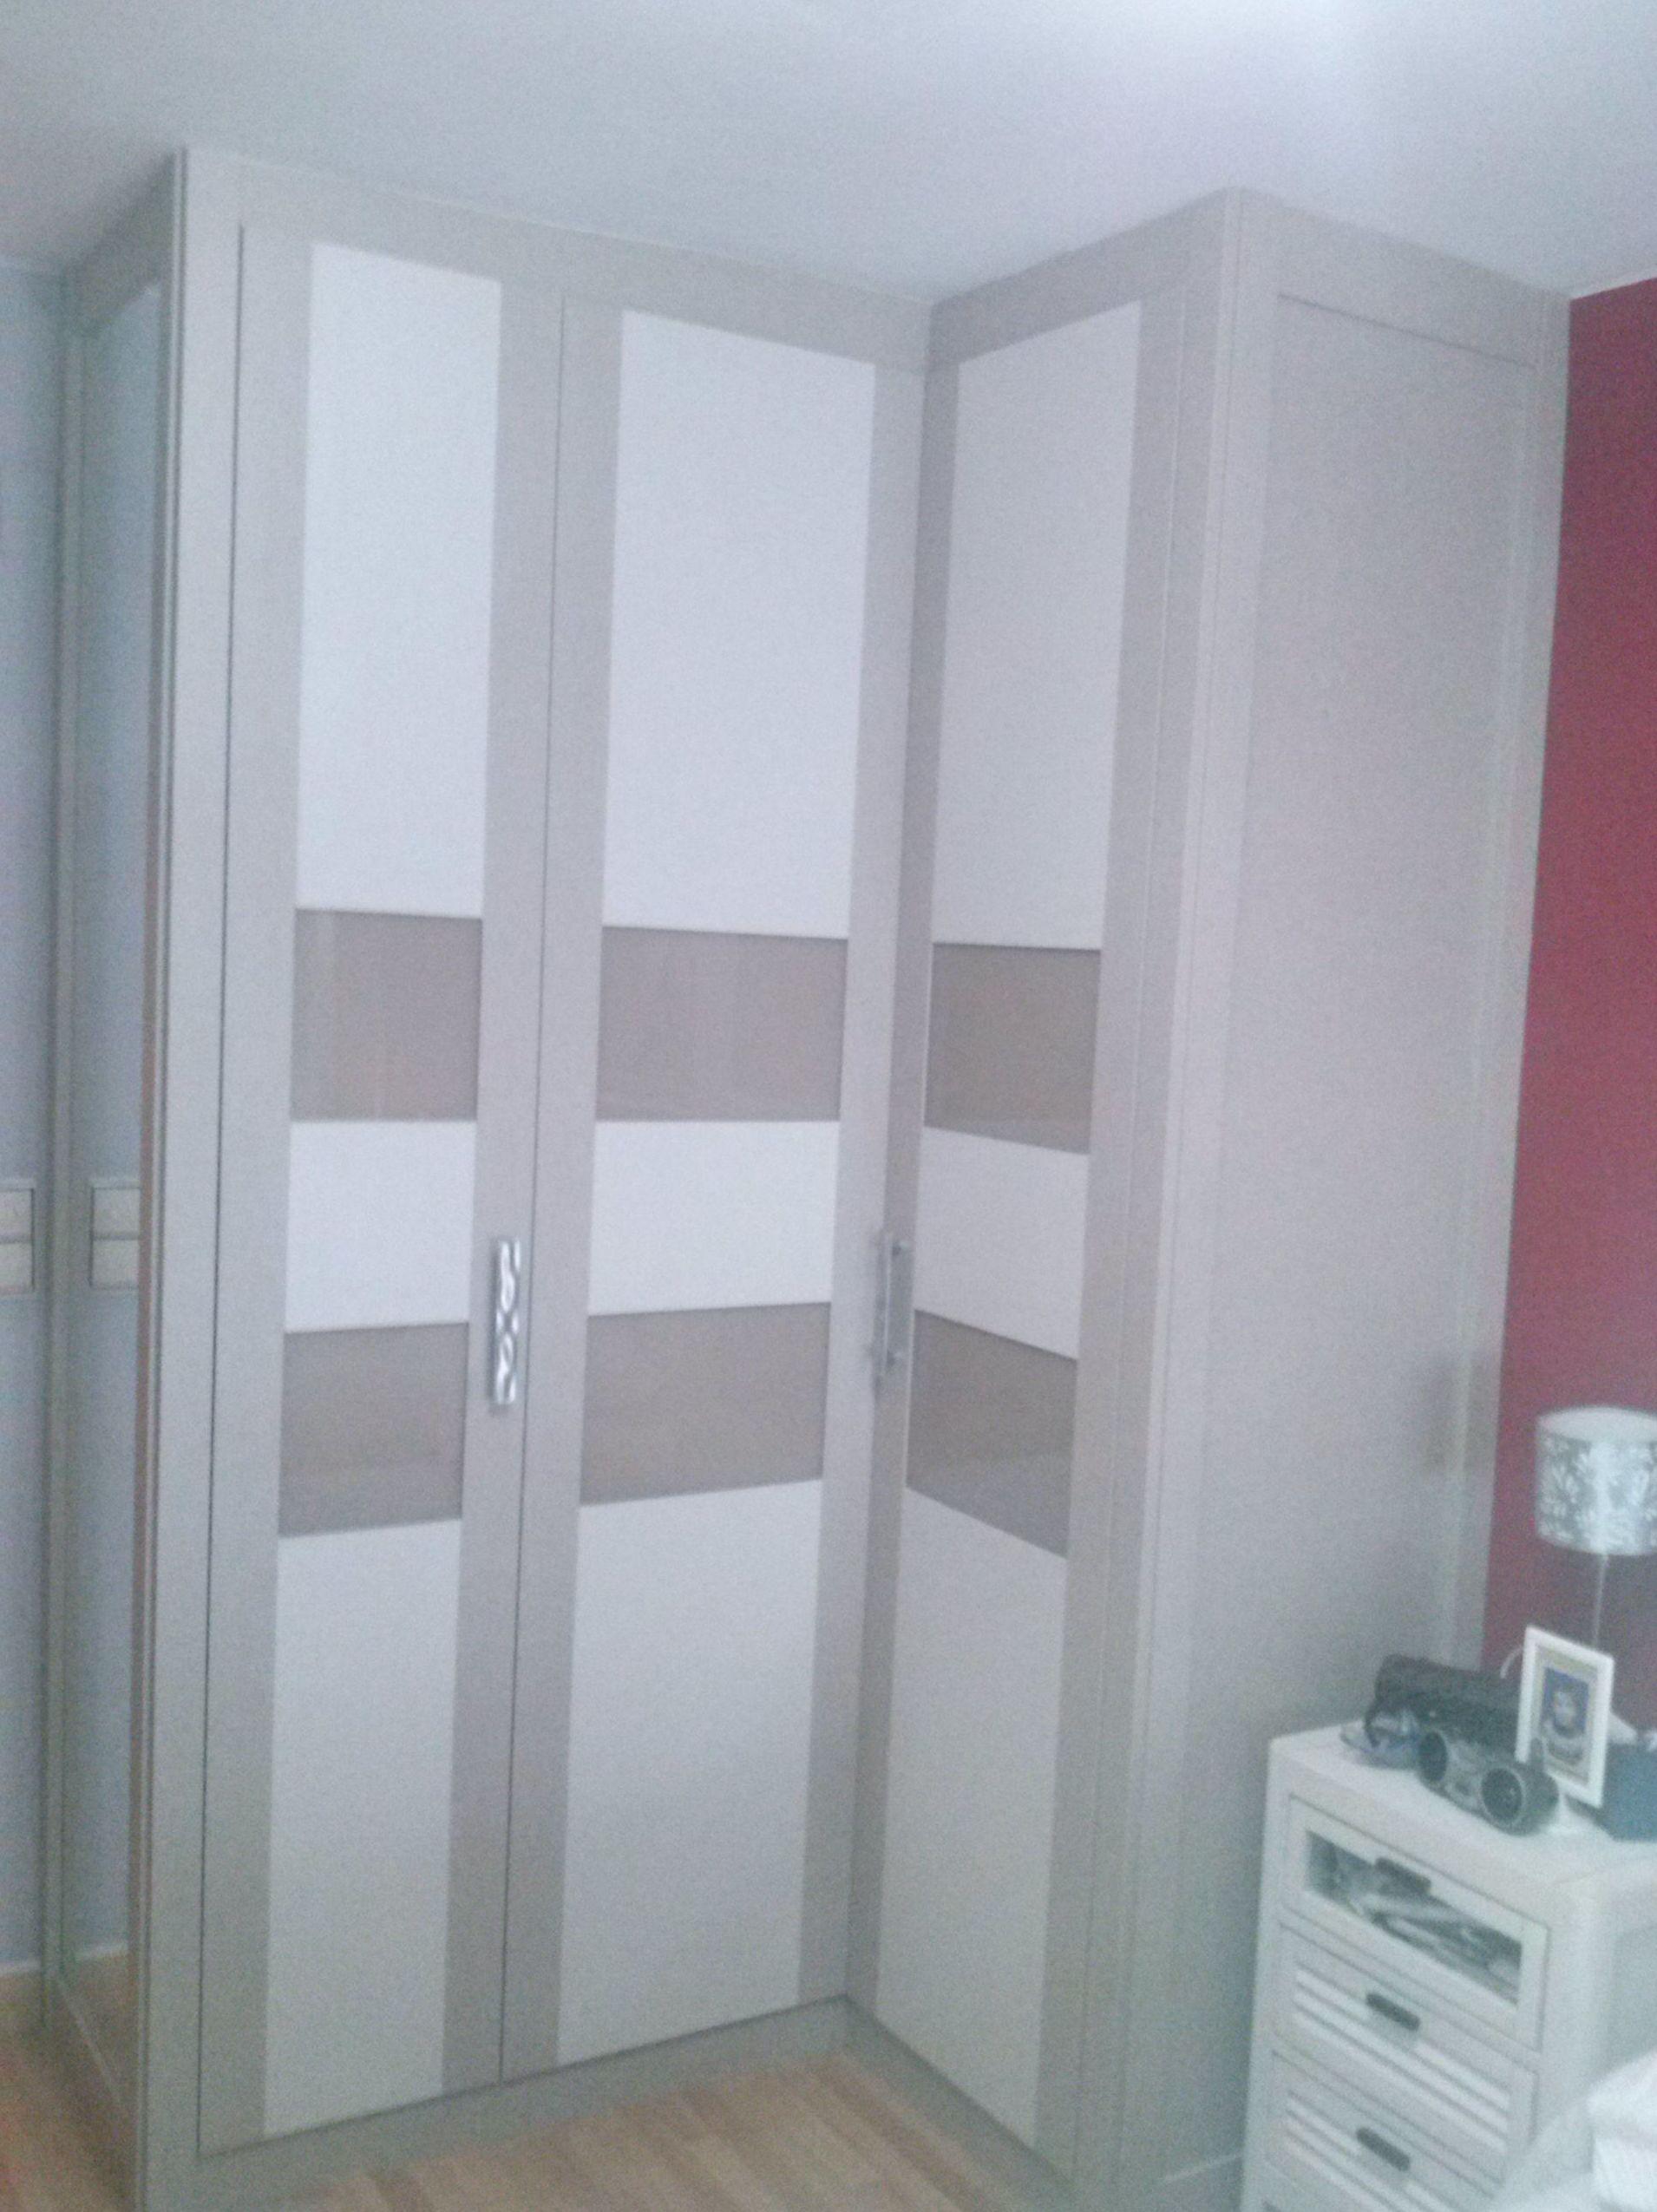 Armarios empotrados modernos top interiores de muebles for Armarios empotrados